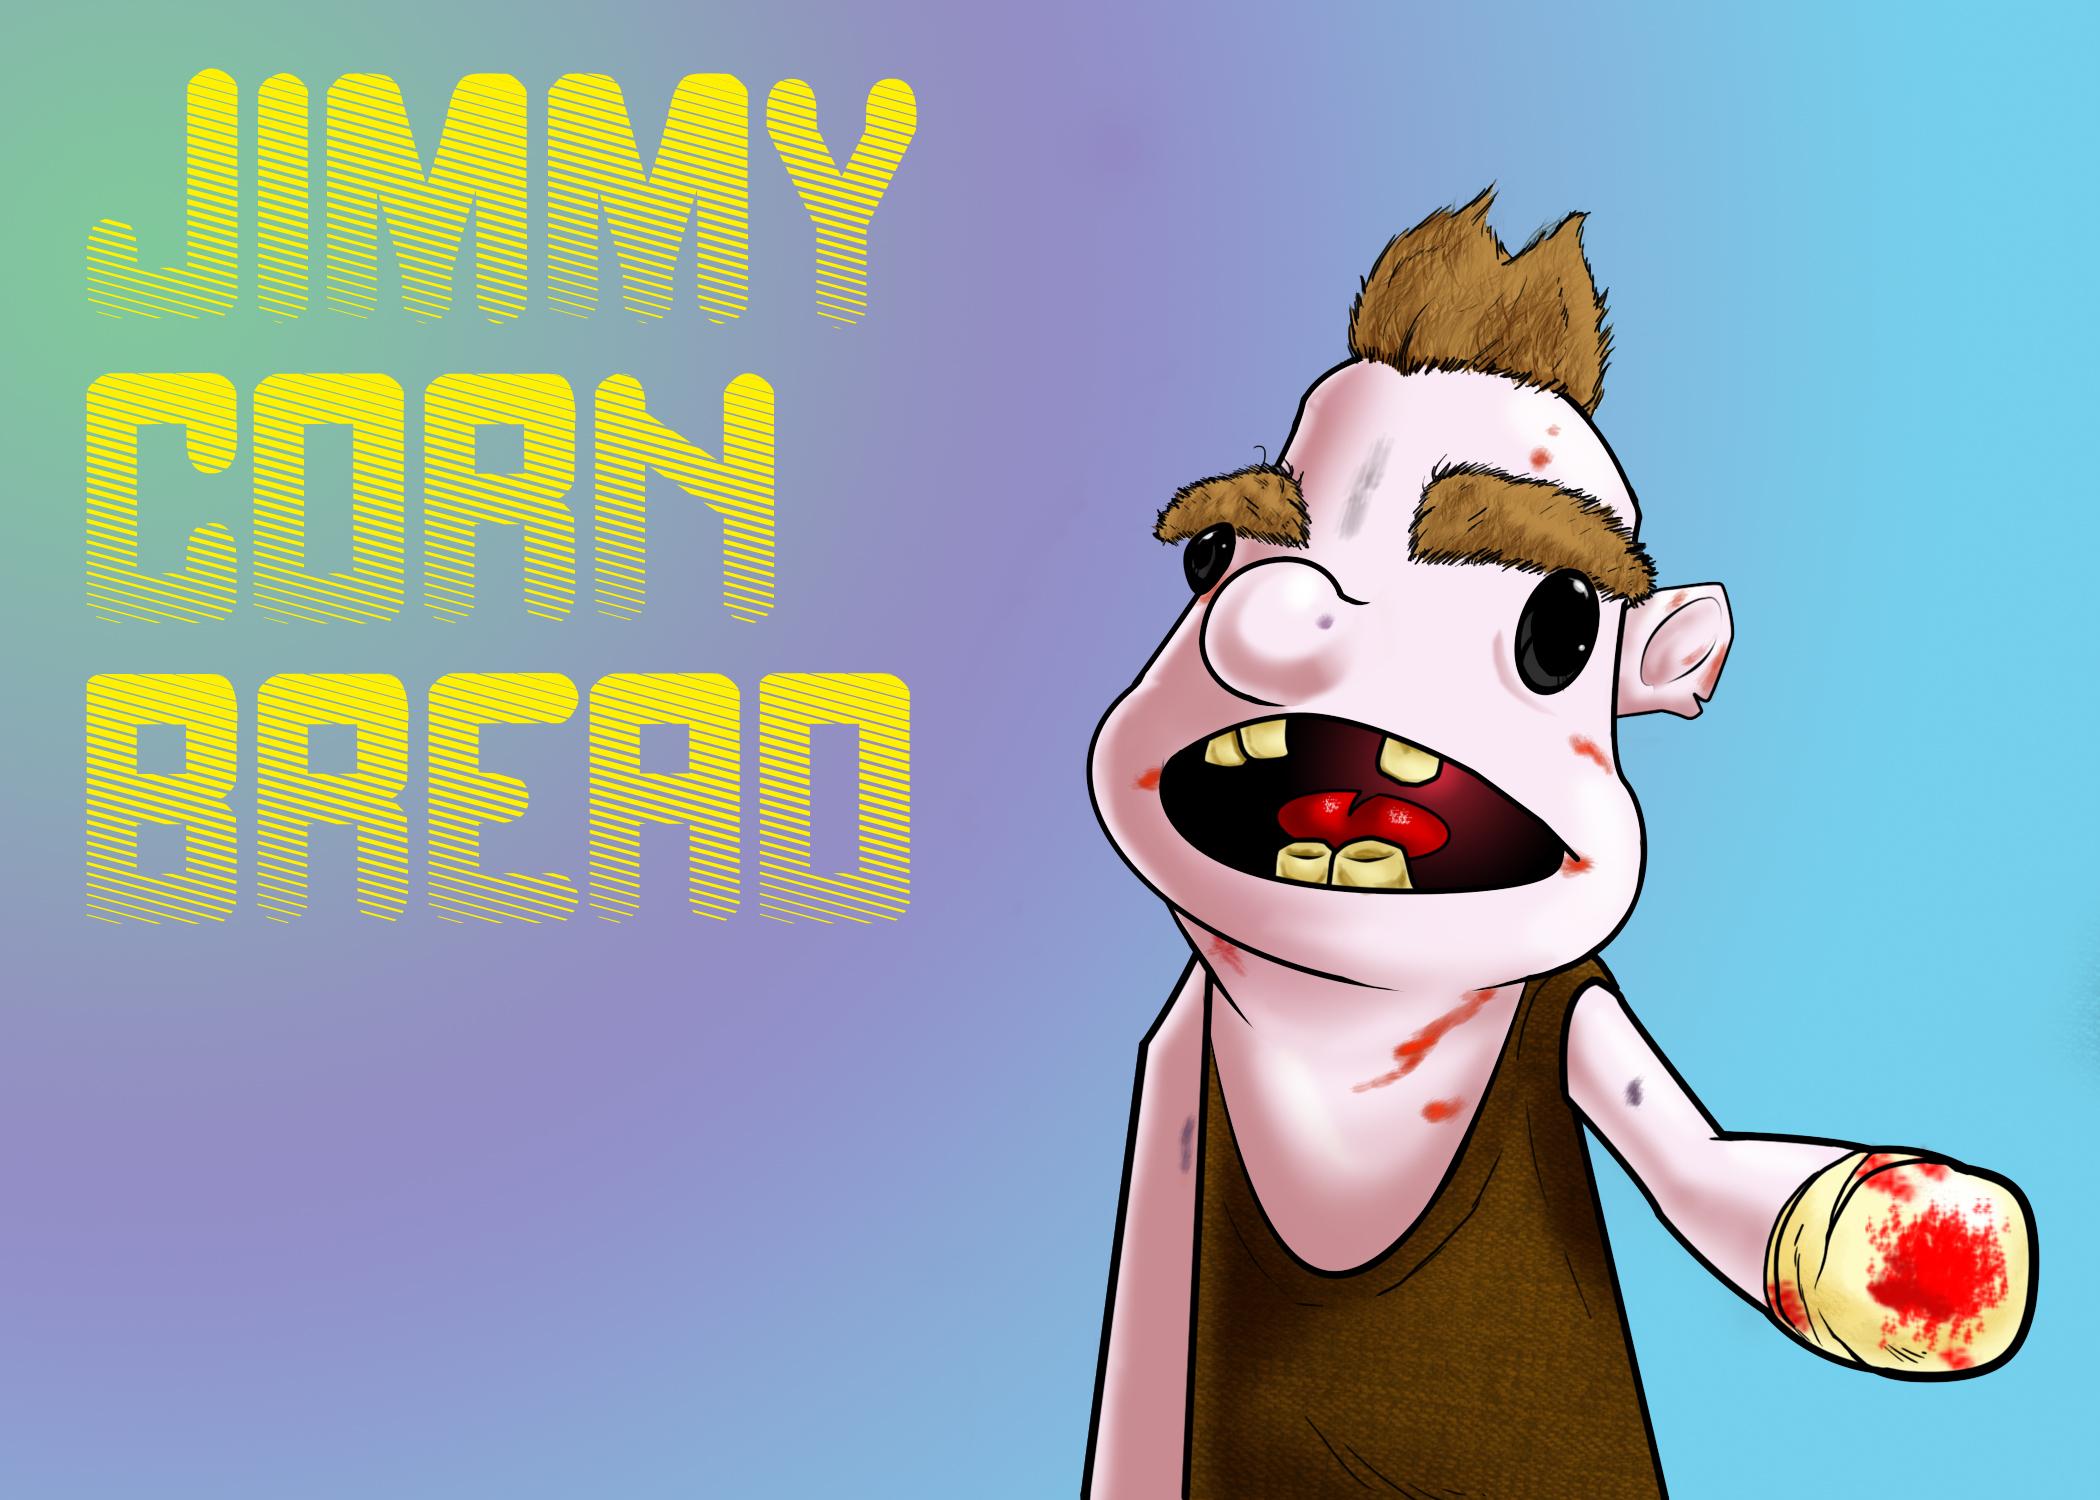 Jimmy Cornbread